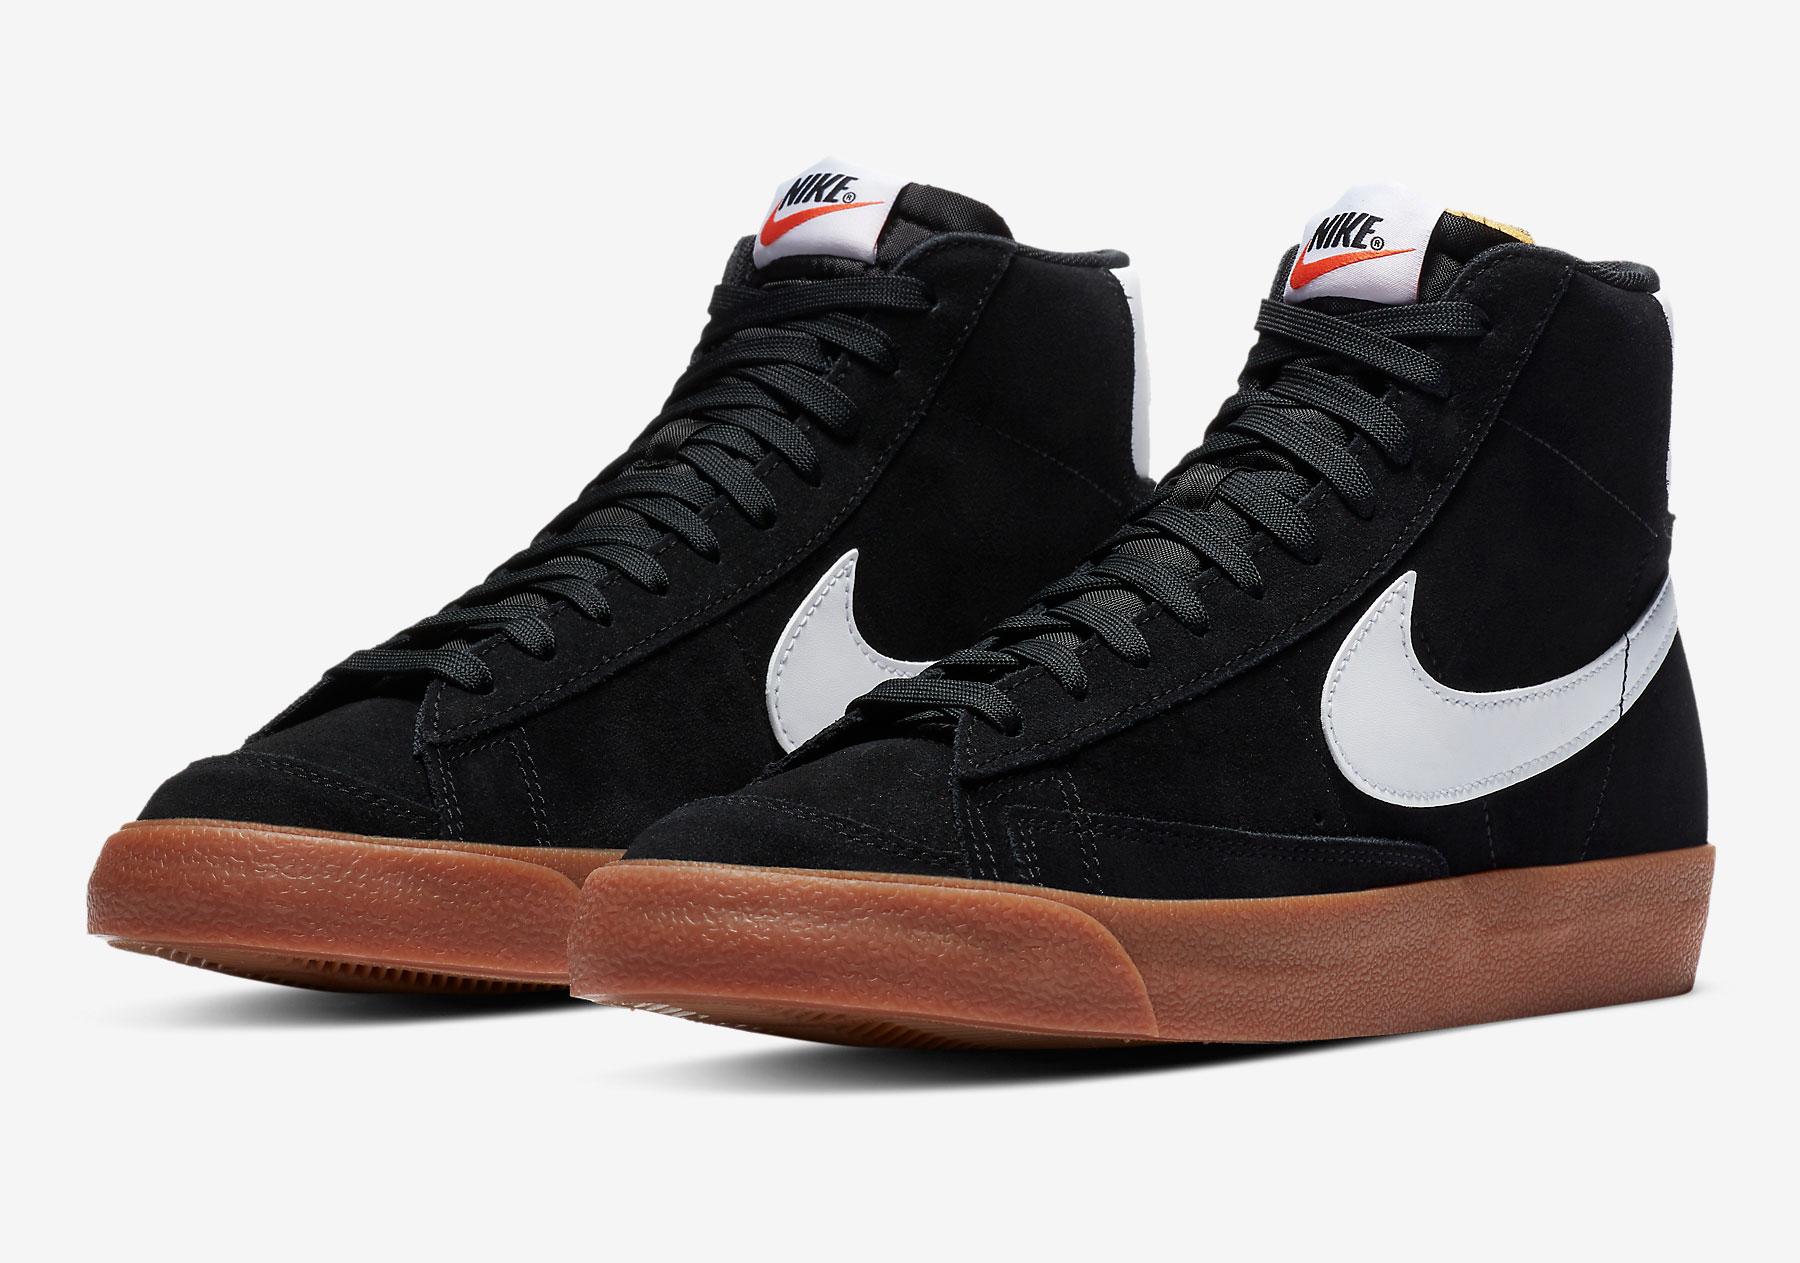 Nike Blazer Mid 77 Noir Gum CI1172-003 - Crumpe